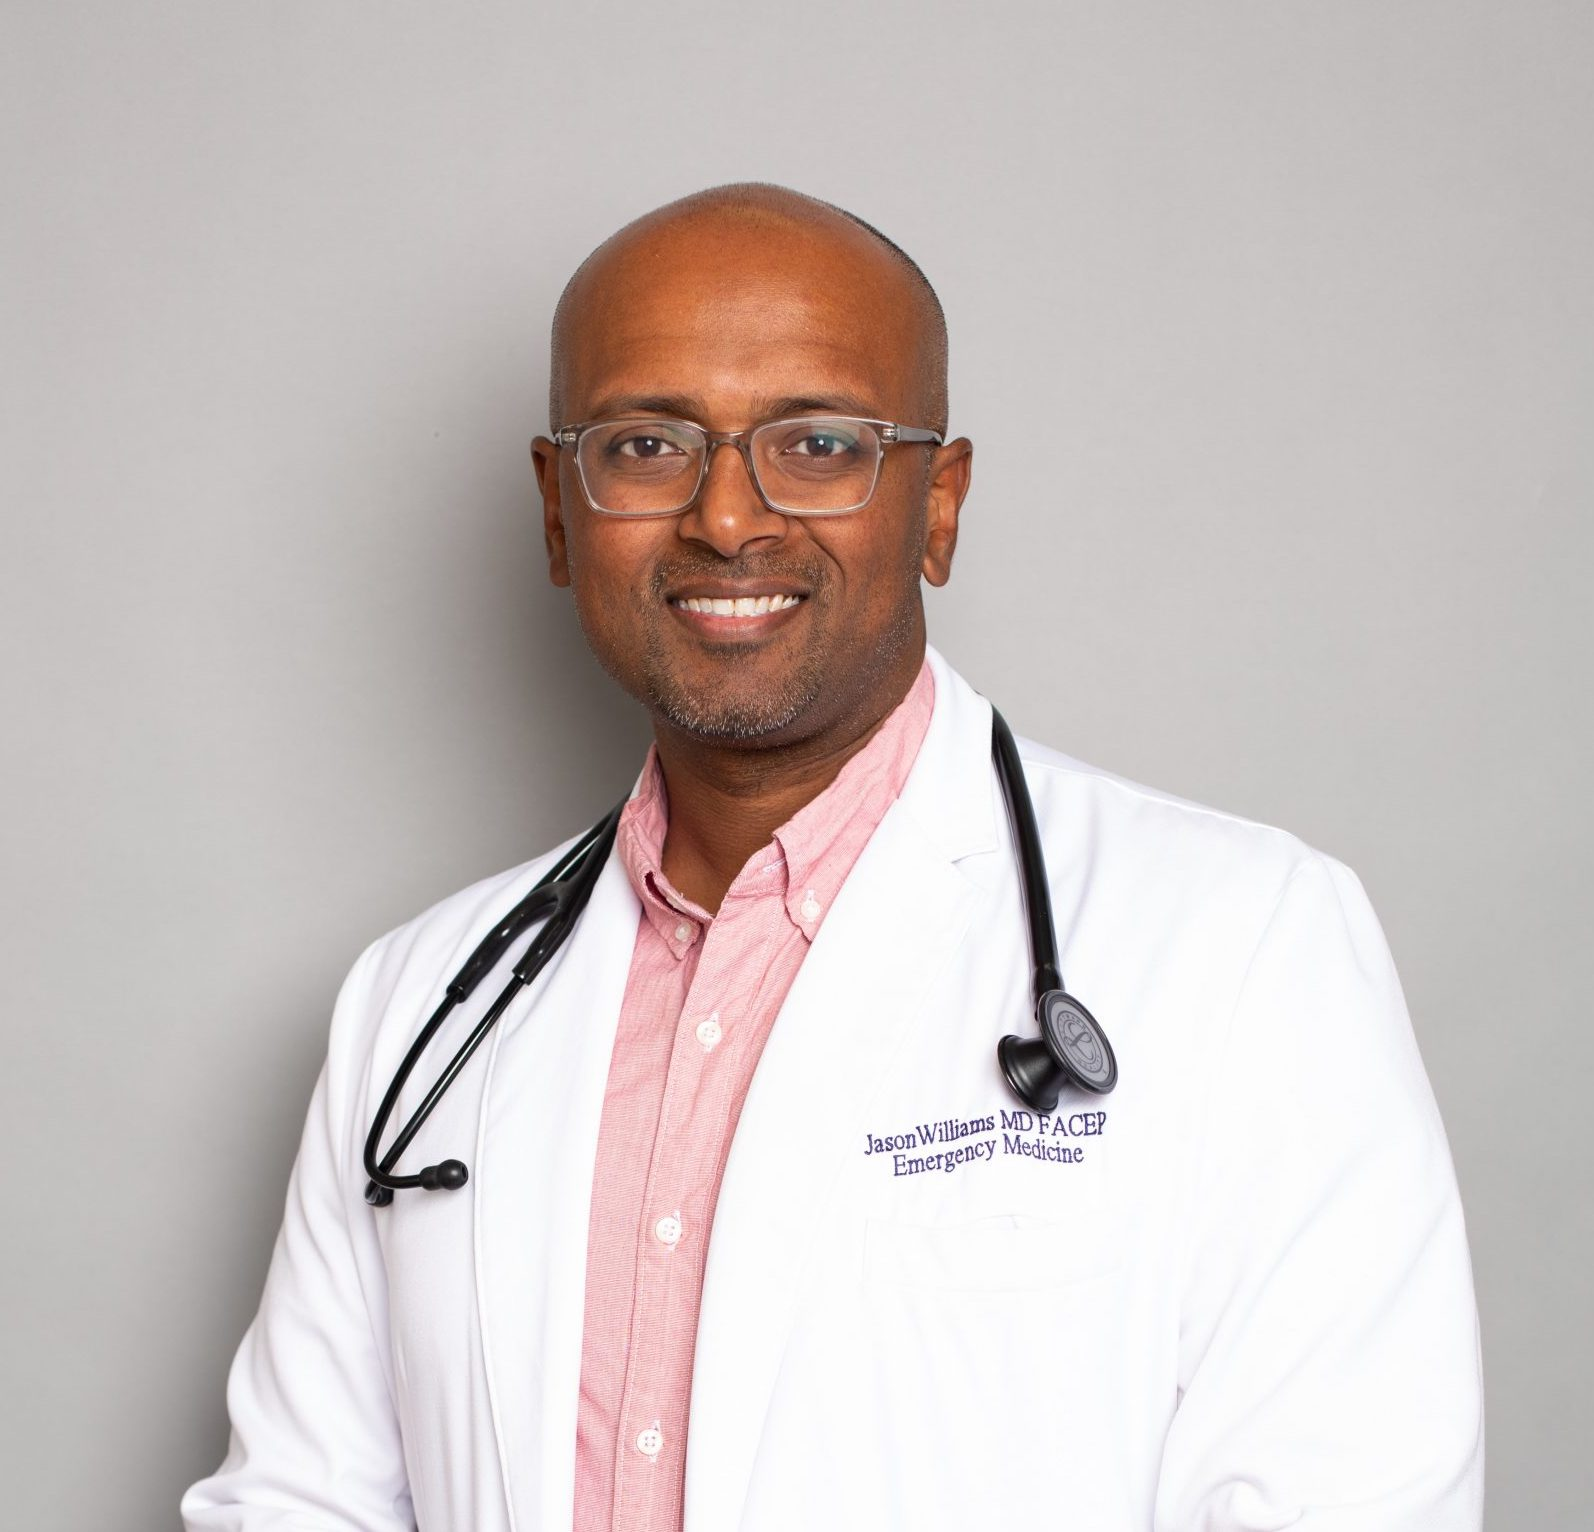 Jason Williams, MD.